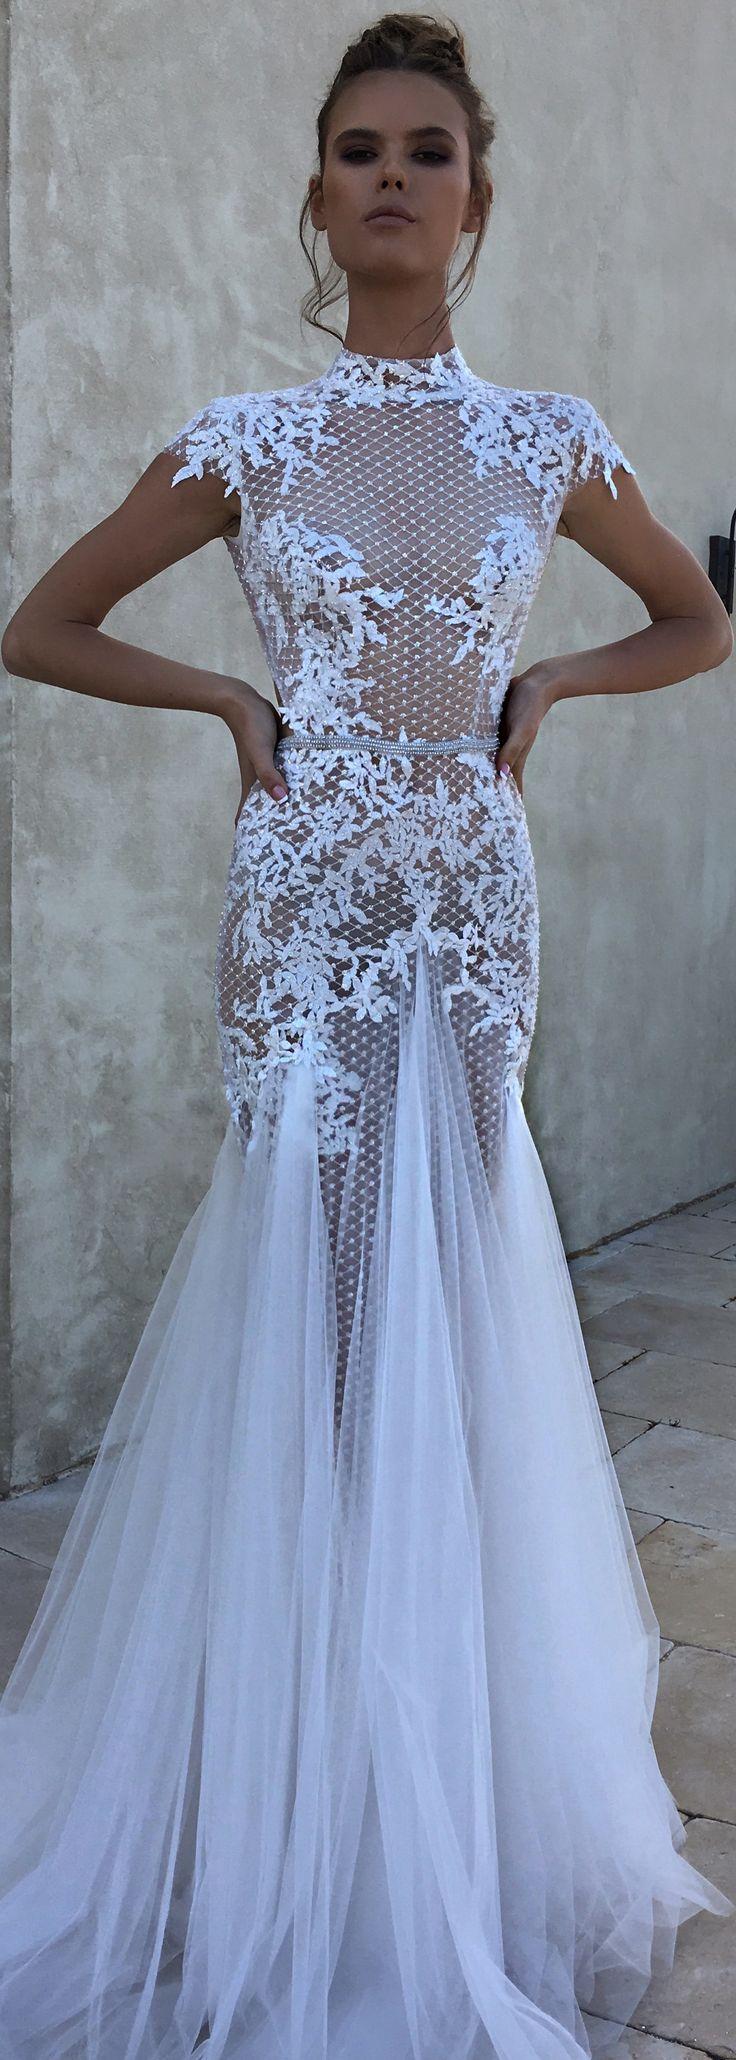 Wedding Dress by Berta Bridal   @beratbridal